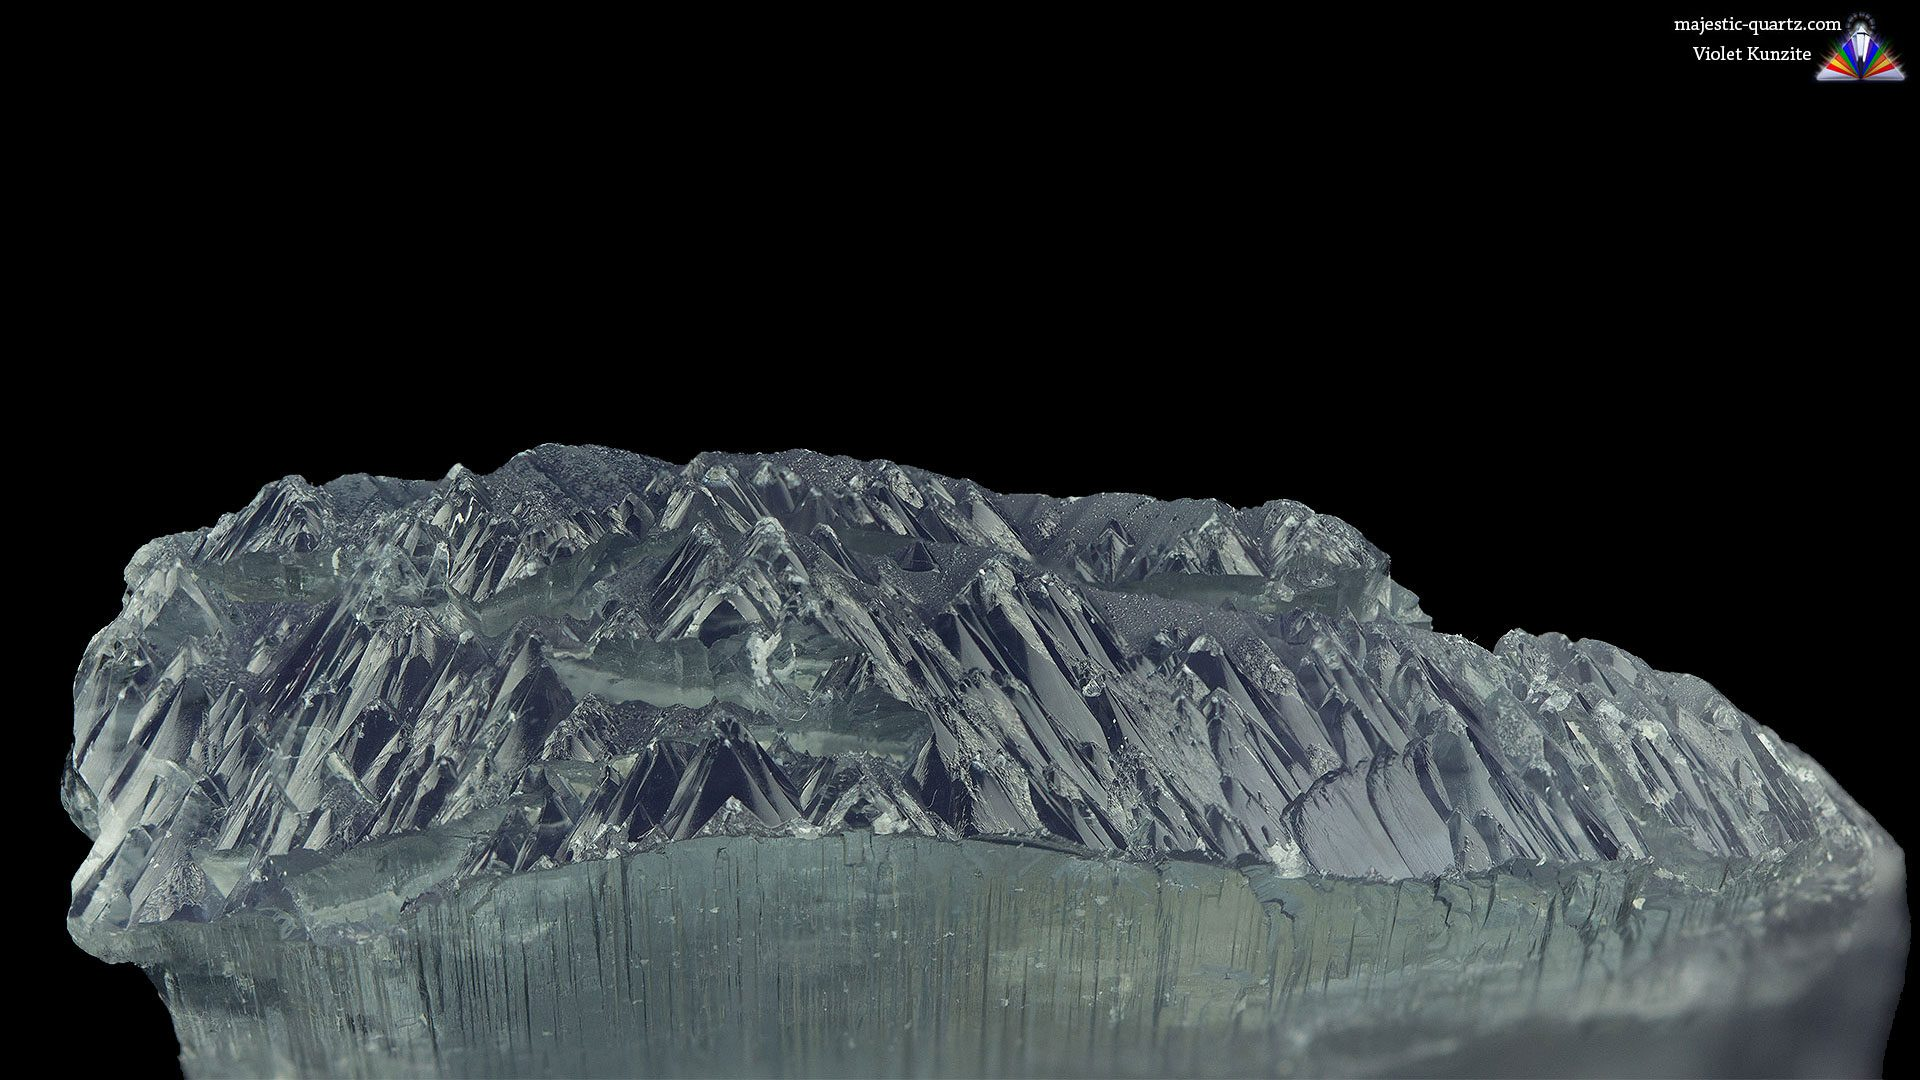 Terminated Violet Kunzite Mineral Specimen - Photograph by Anthony Bradford